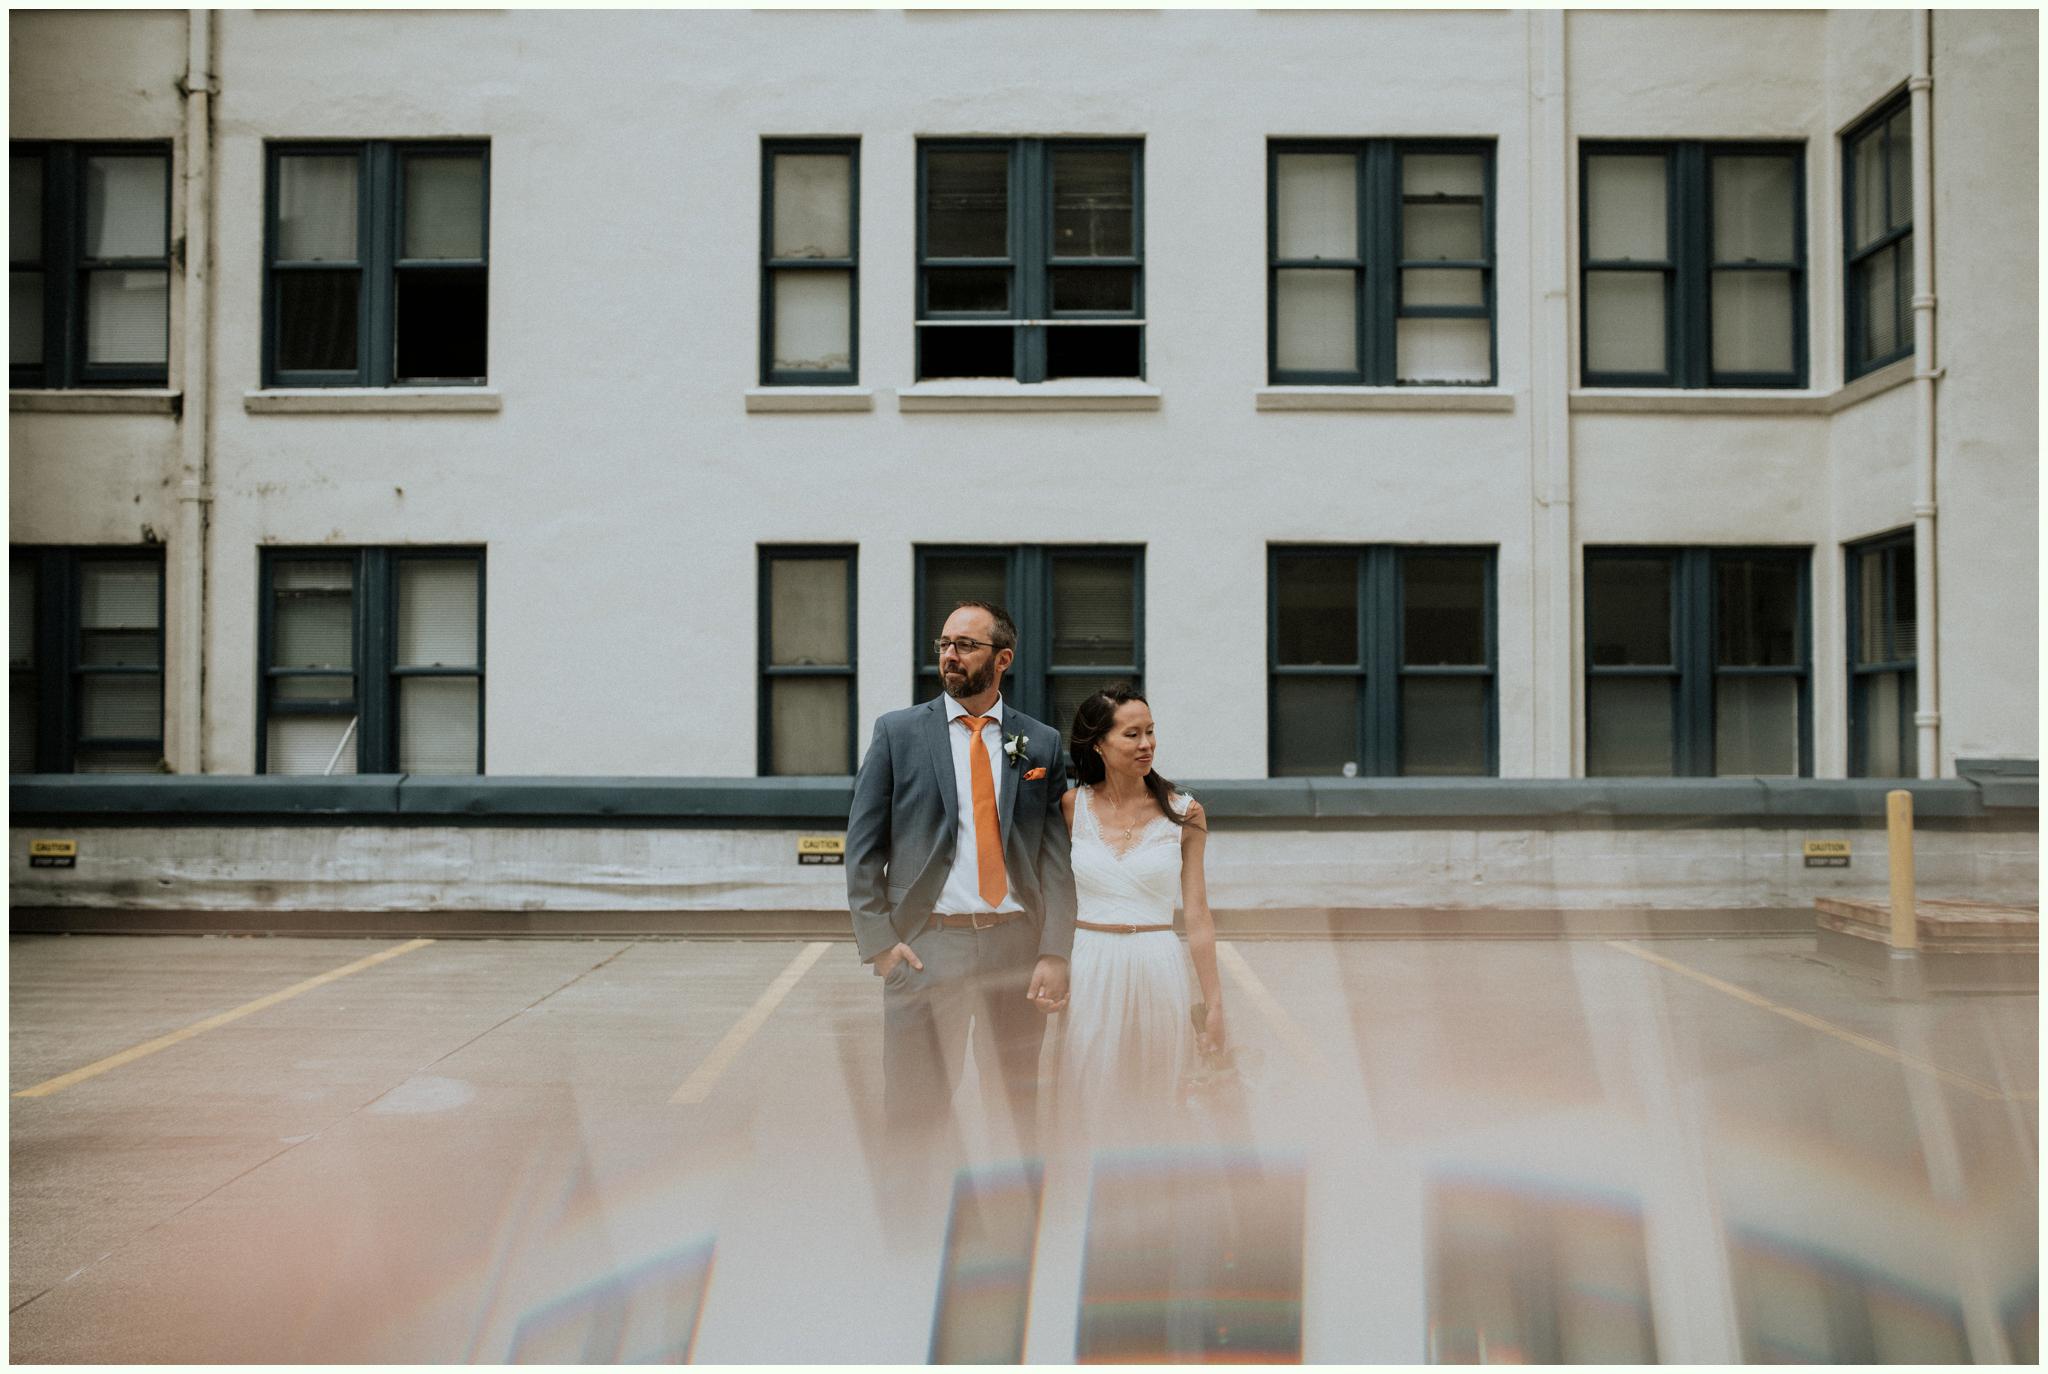 within-sodo-june-wedding-seattle-photographer-caitlyn-nikula-37.jpg